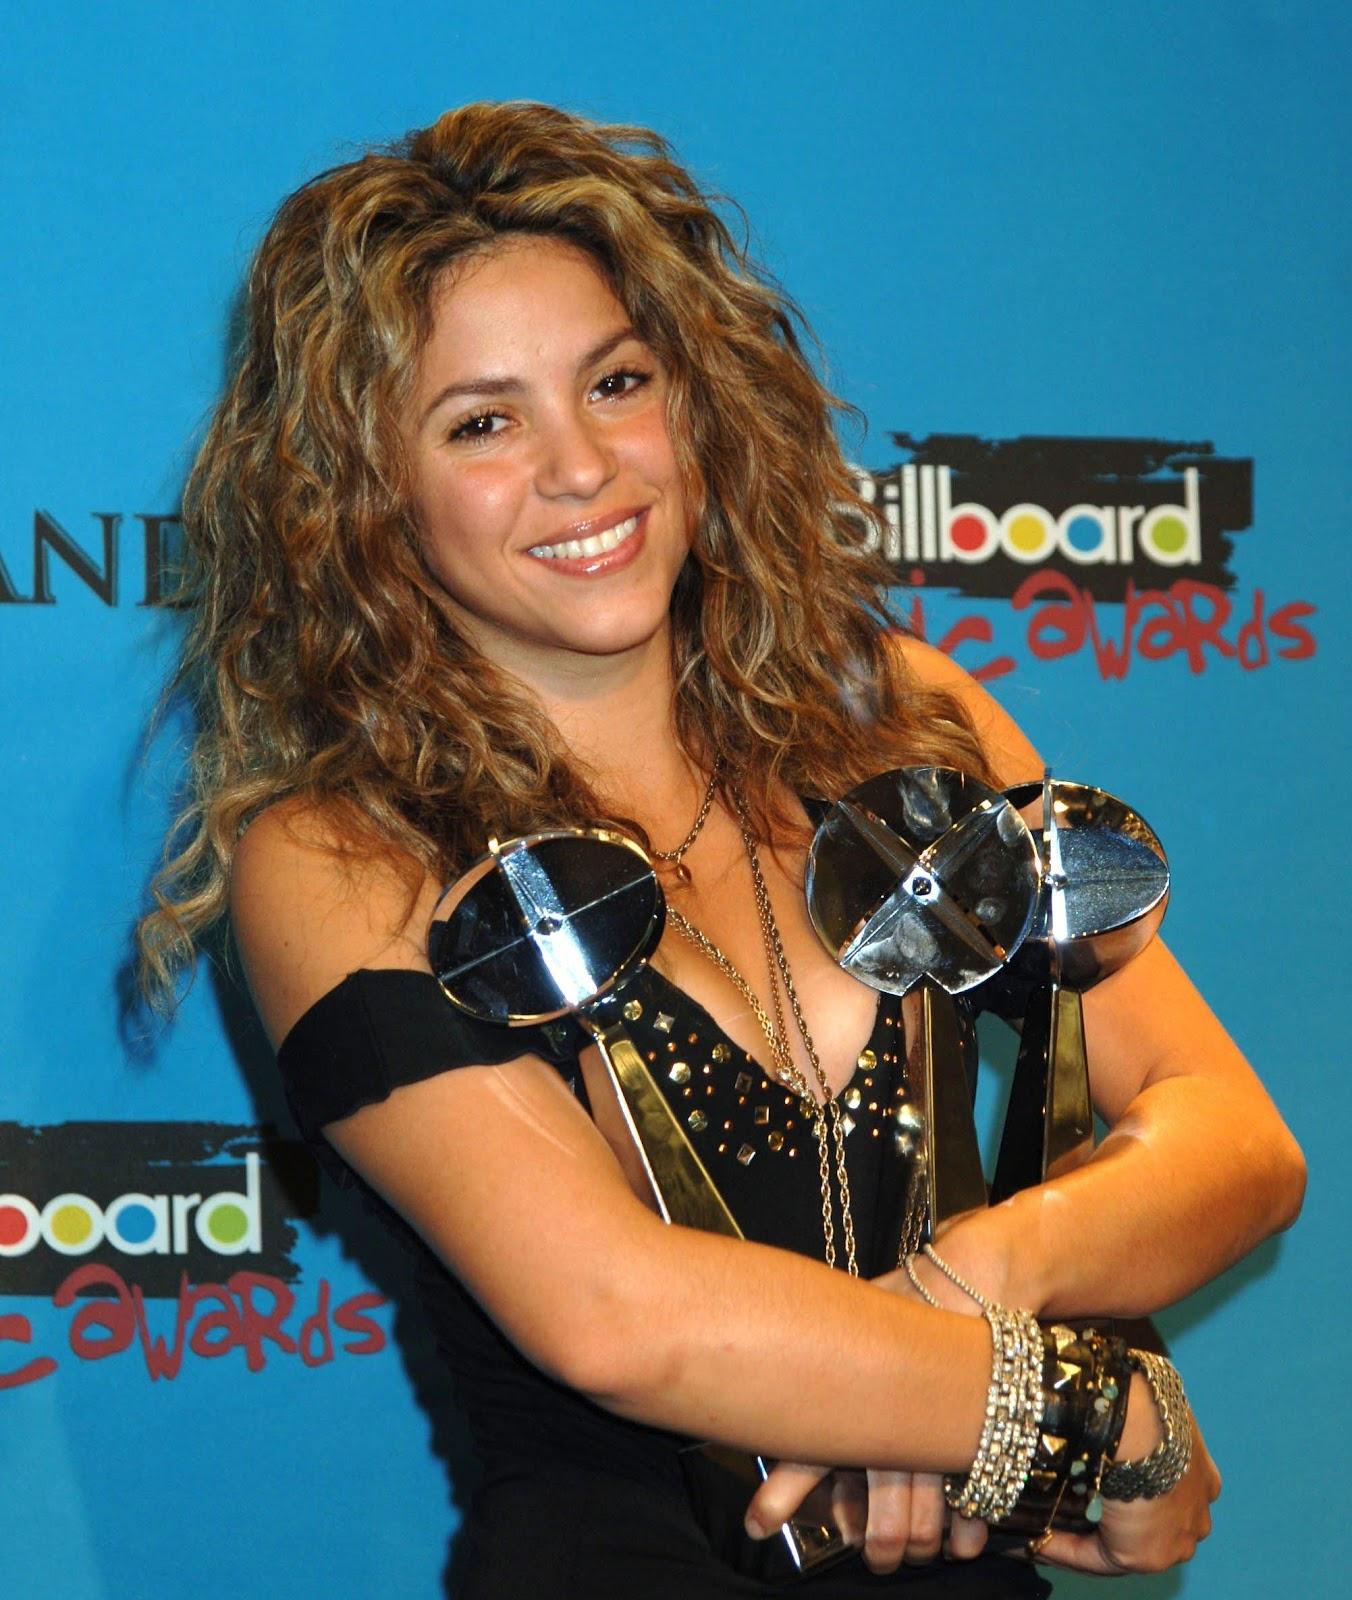 http://3.bp.blogspot.com/-v4gELRWE00Y/T7kfMYnJKhI/AAAAAAAANNI/G4iWSv1Q_qw/s1600/xl_Shakira_CV1%7E3.jpg